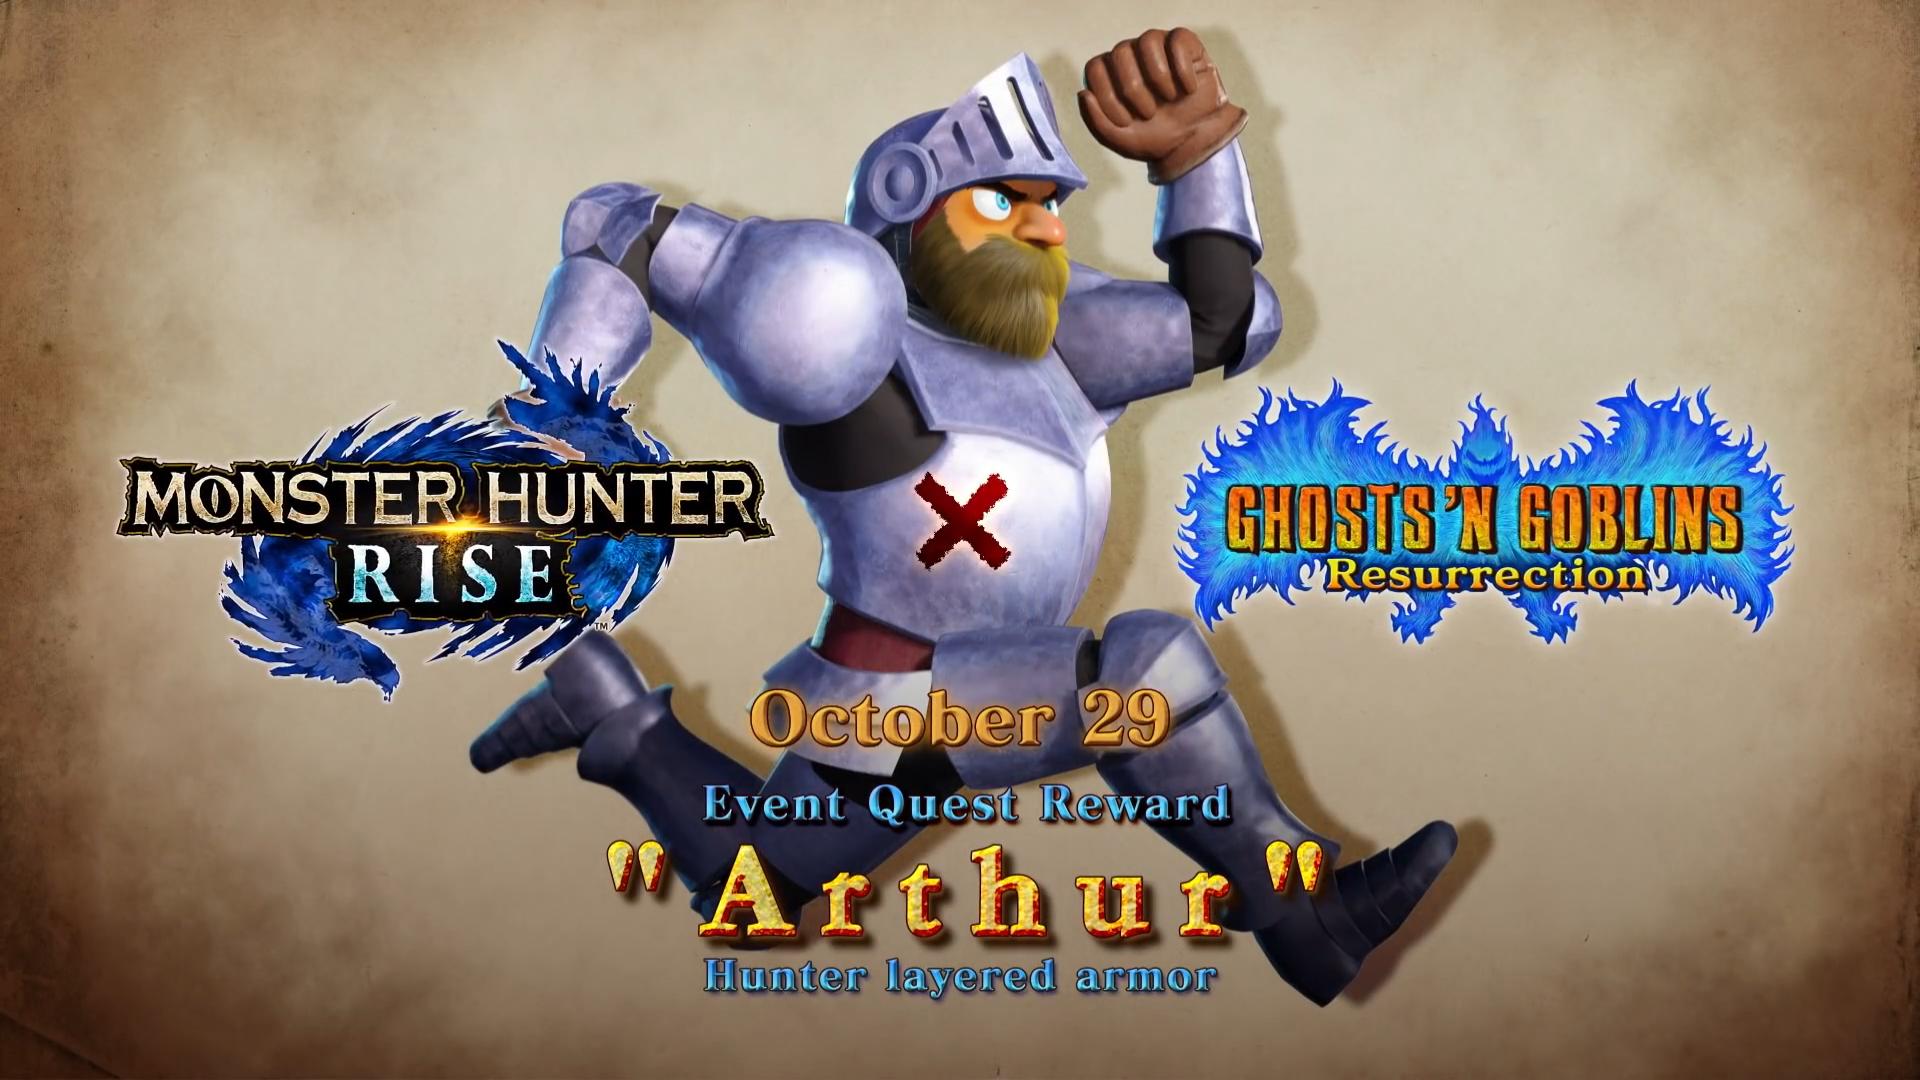 Monster Hunter Rise X Ghosts 'N Goblins